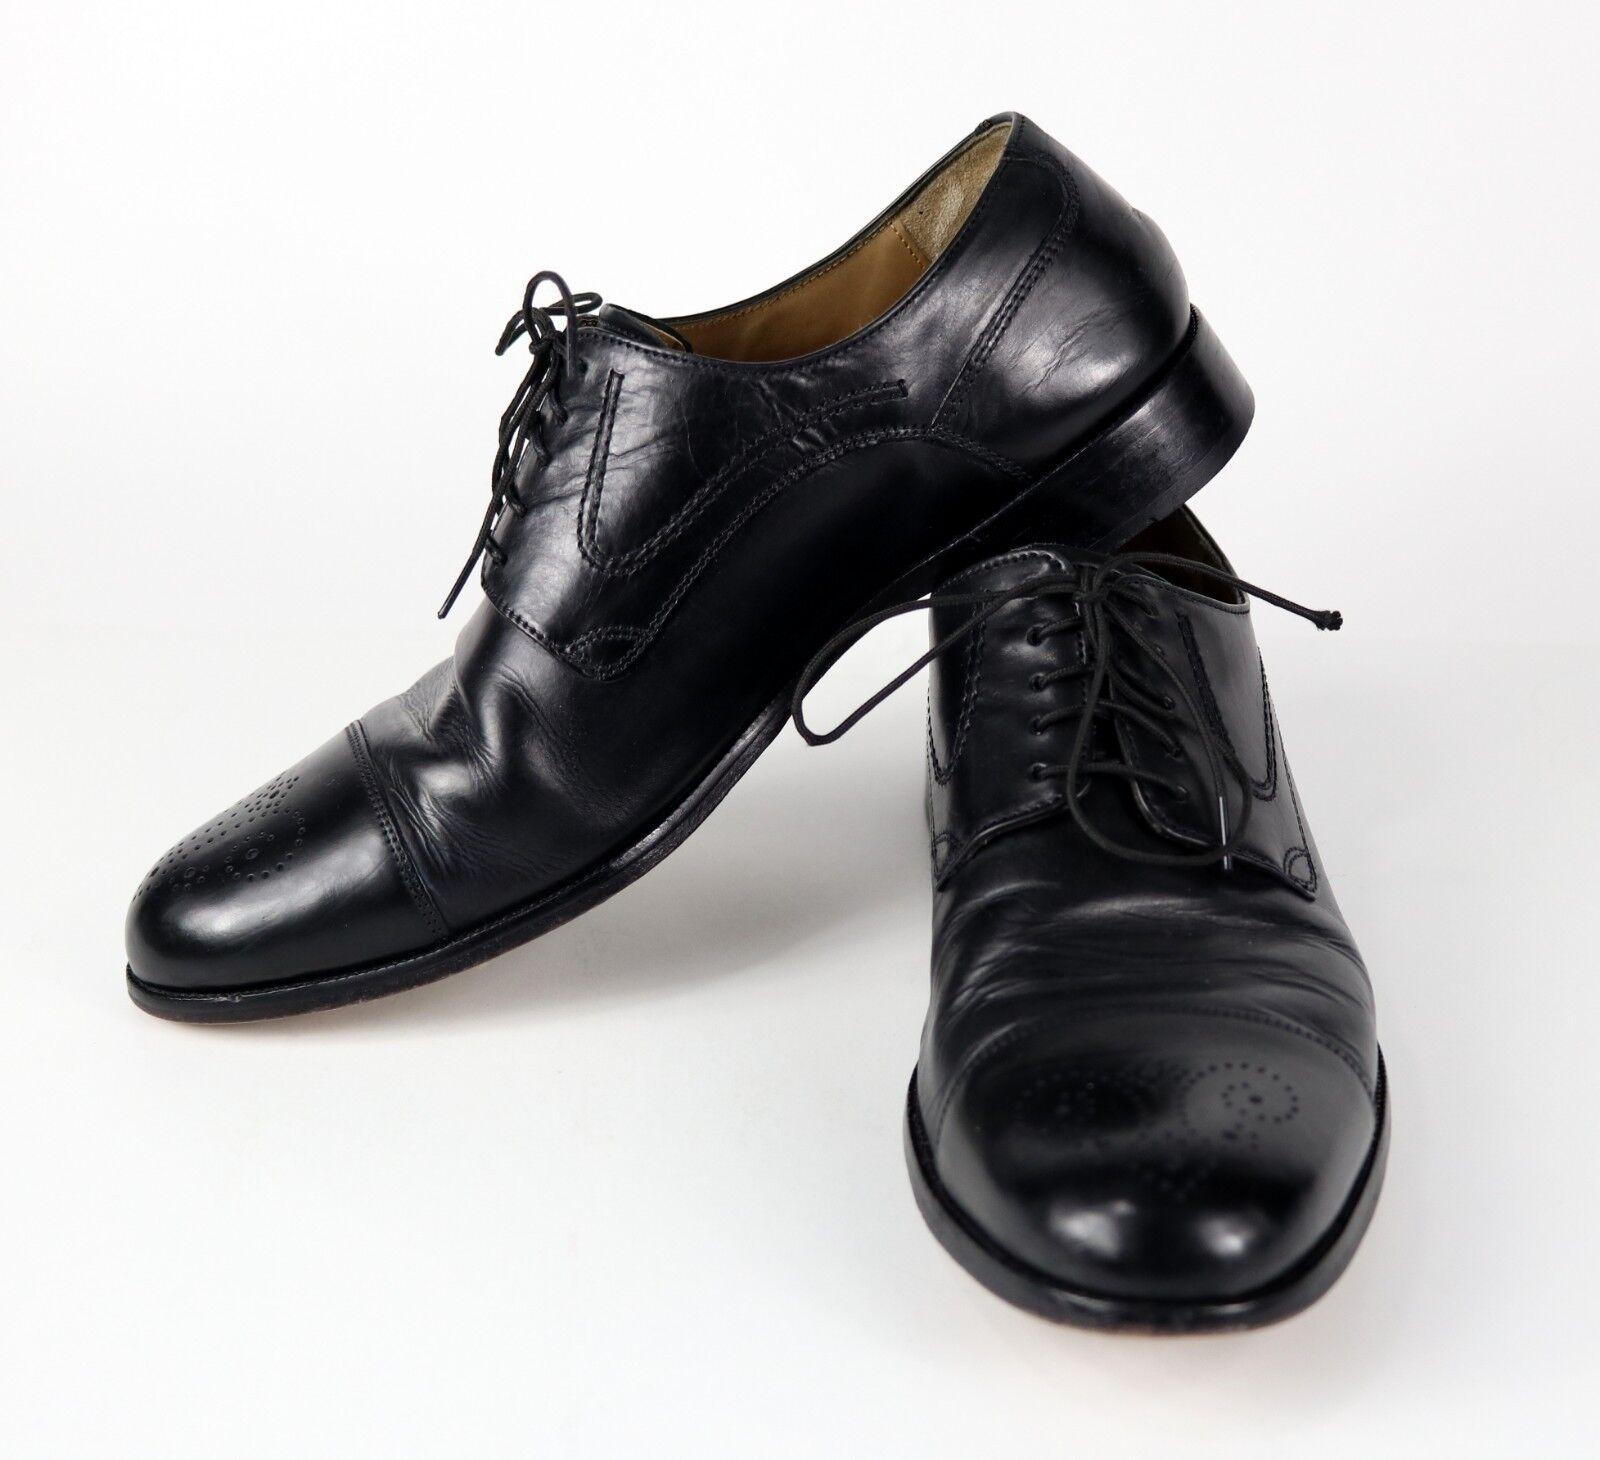 Black Signature   JOHNSTON MURPHY   Men's 10 B M Leather Cap Toe Dress shoes